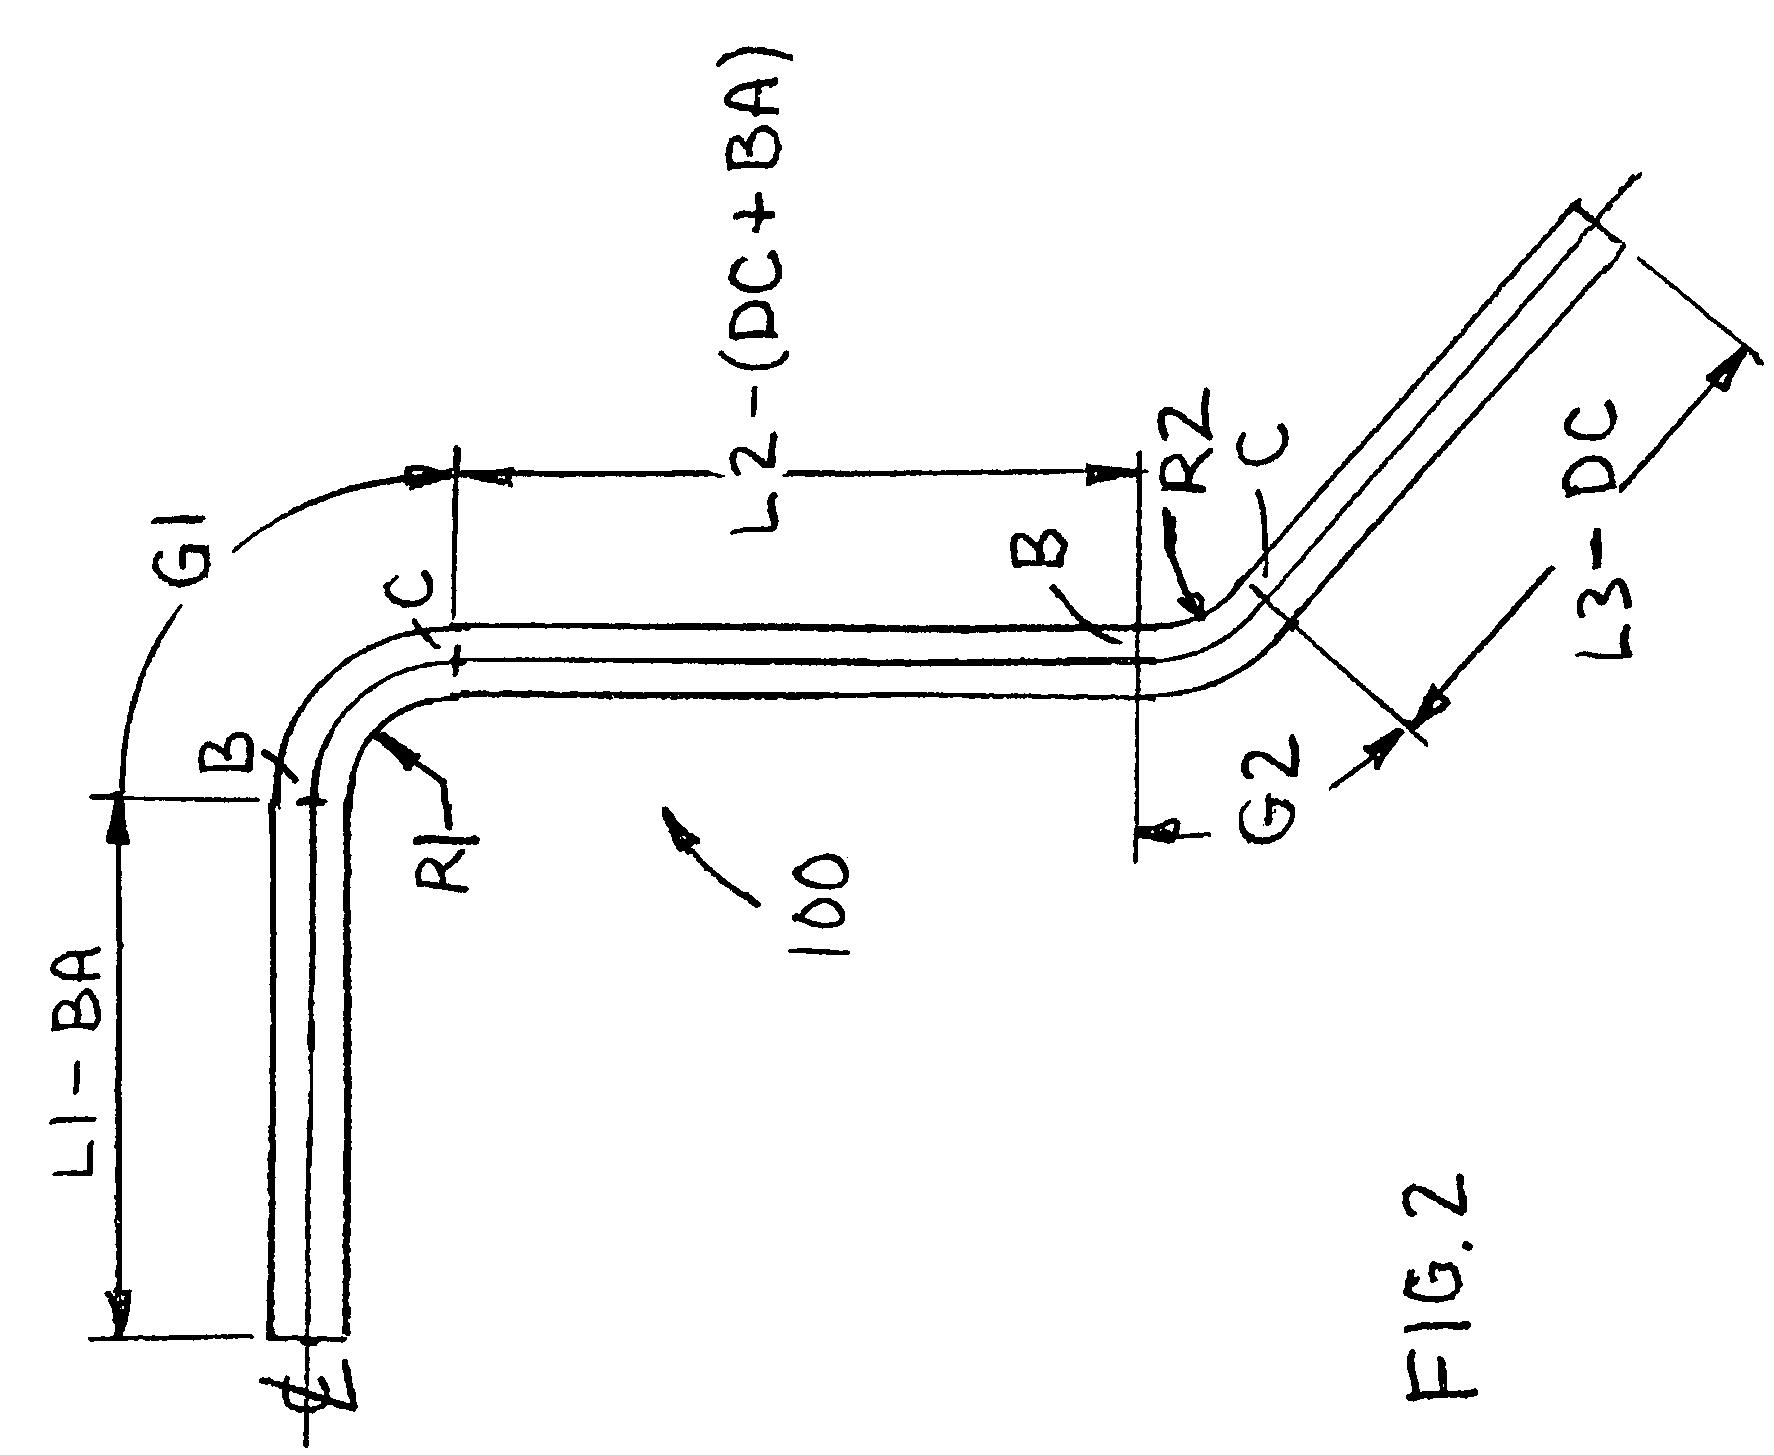 patente us7624511 pipe bending template google patentes